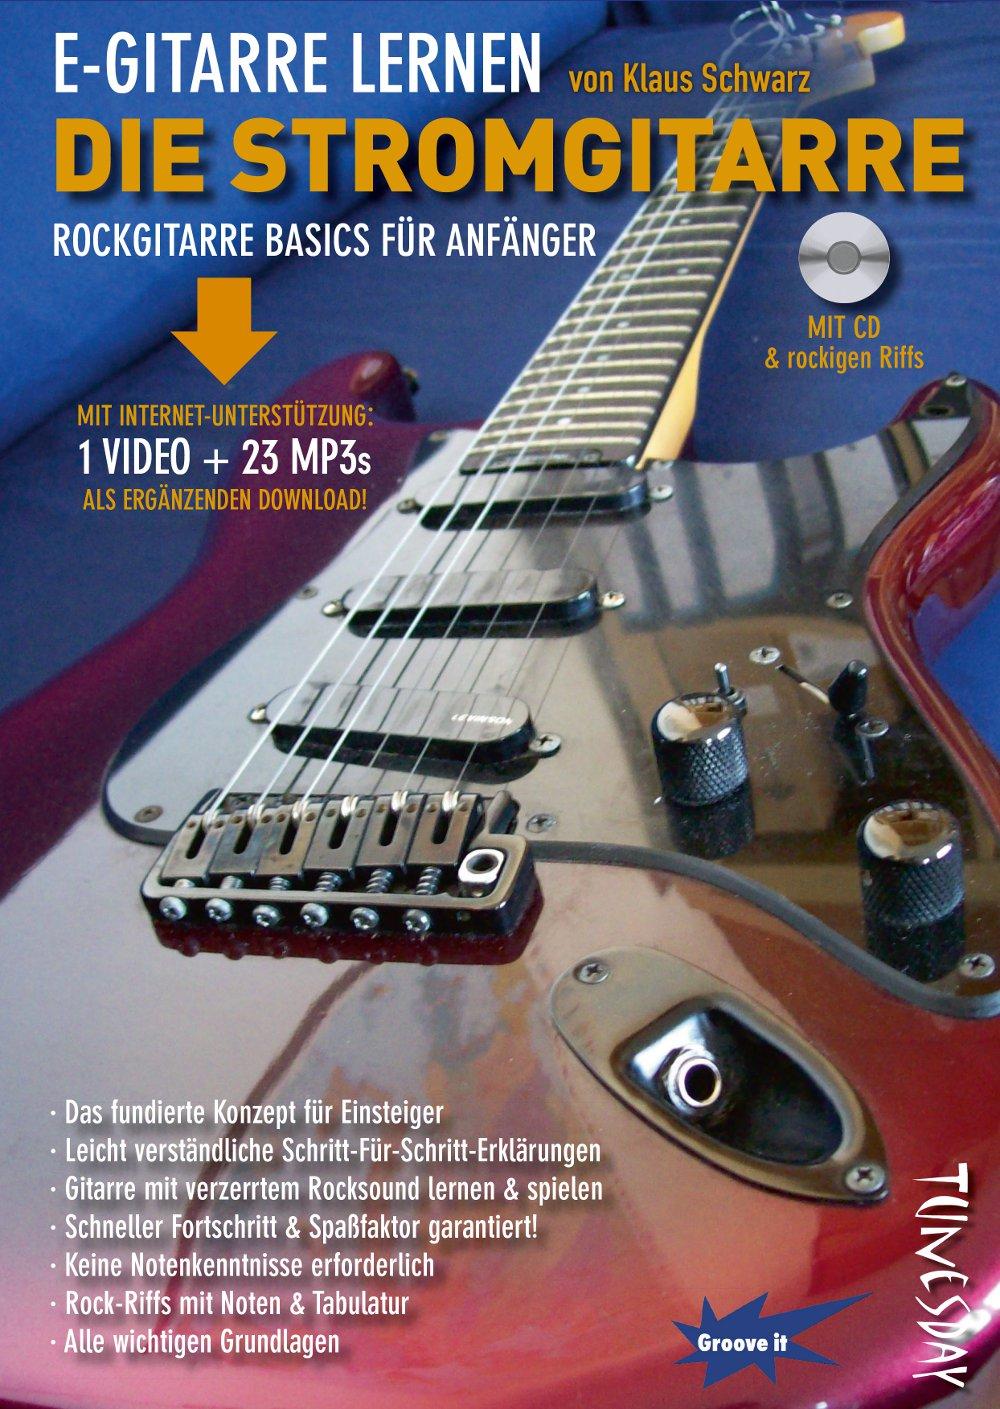 E-Gitarre lernen - DIE STROMGITARRE - Rockgitarre Basics ...